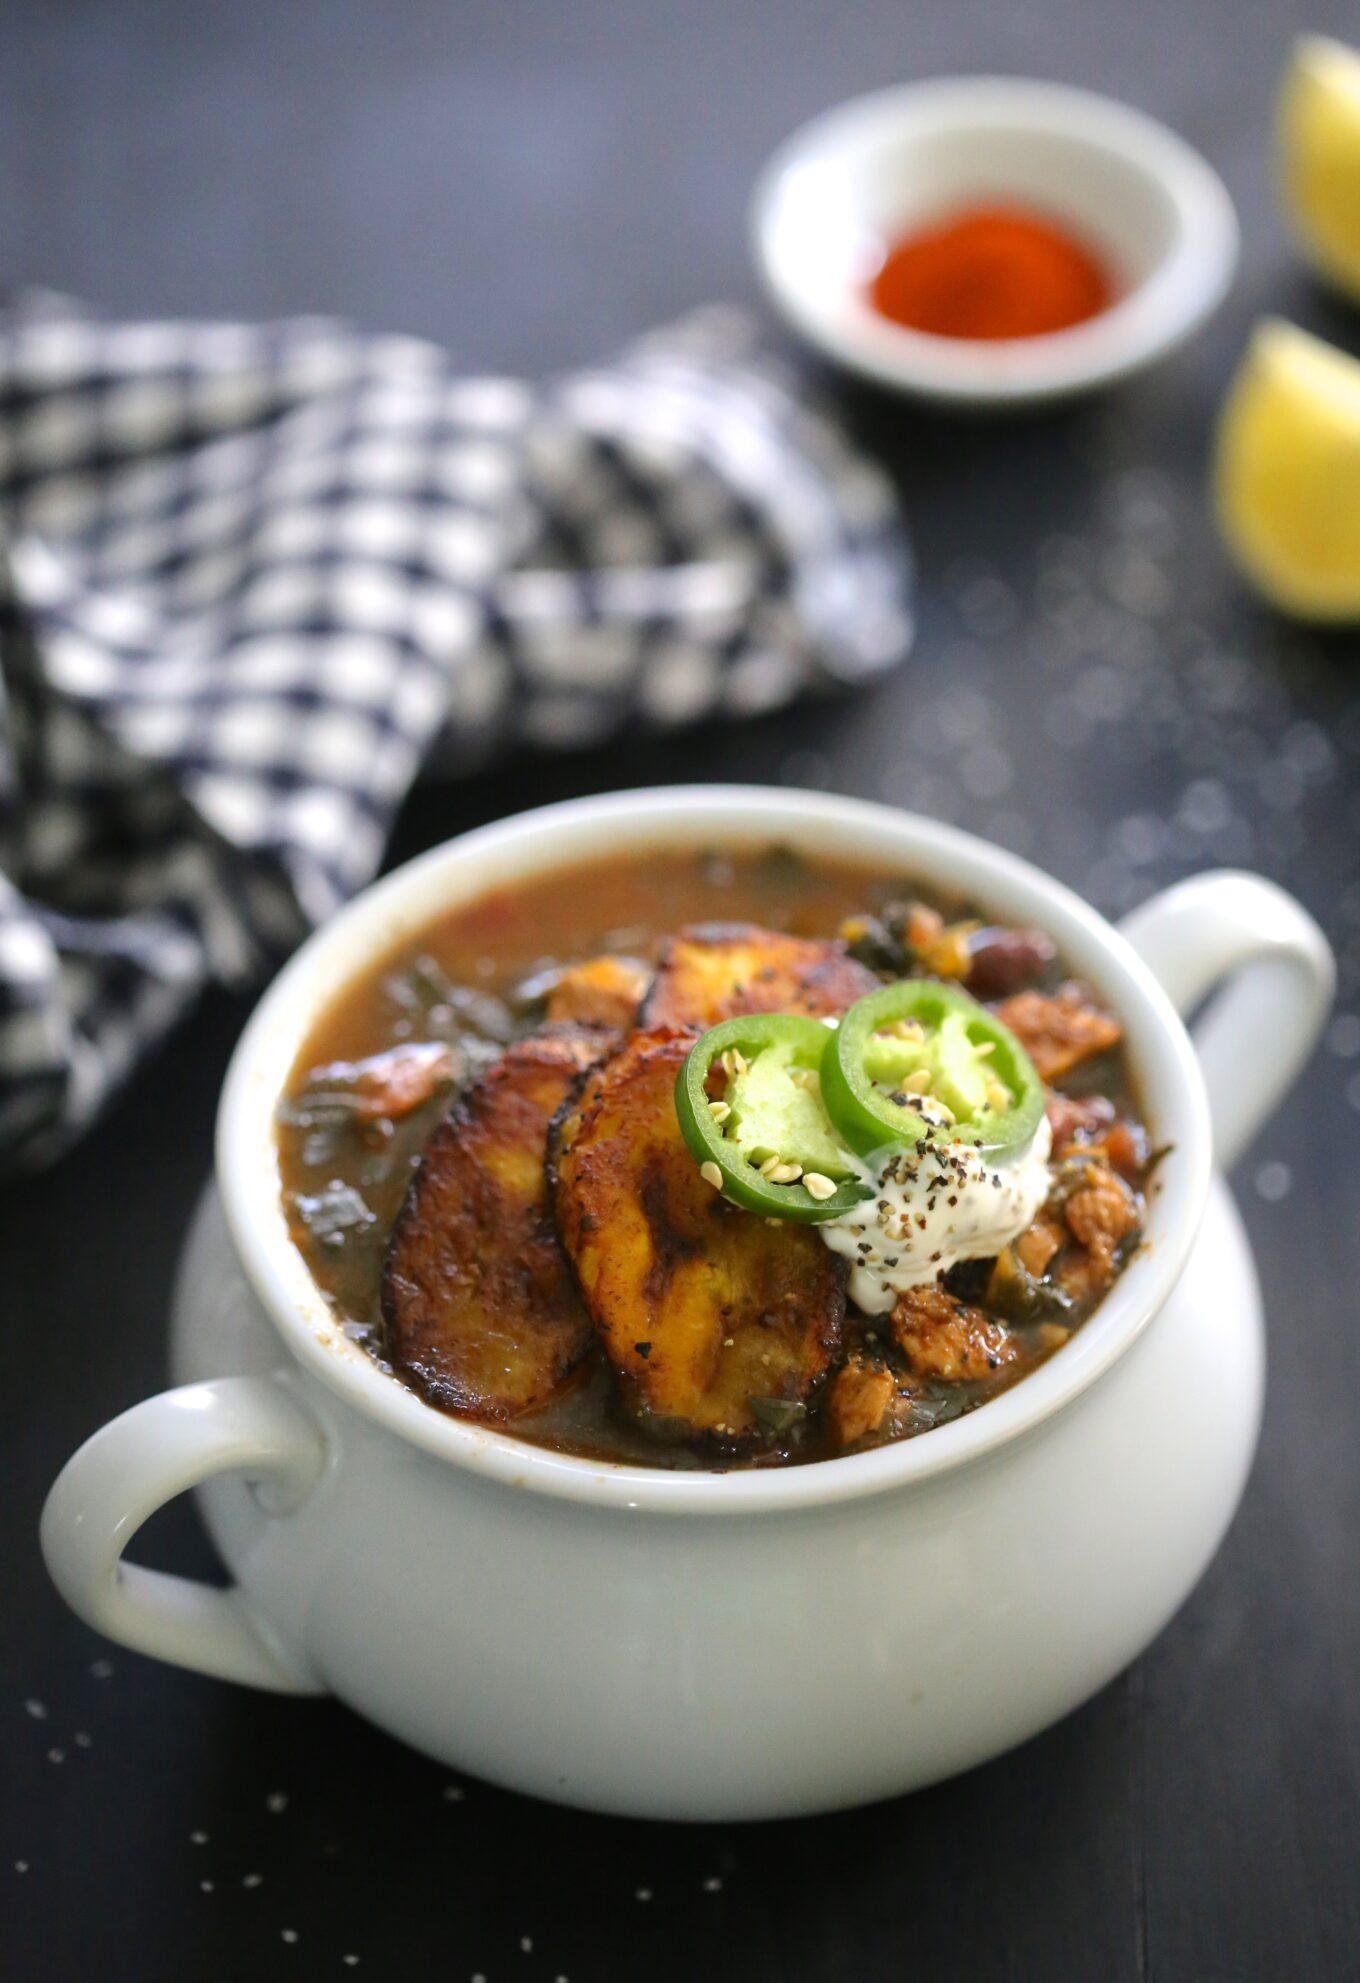 Cuban Chicken Black Bean Kale Soup With Fried Plantains Www Climbinggriermountain Com I